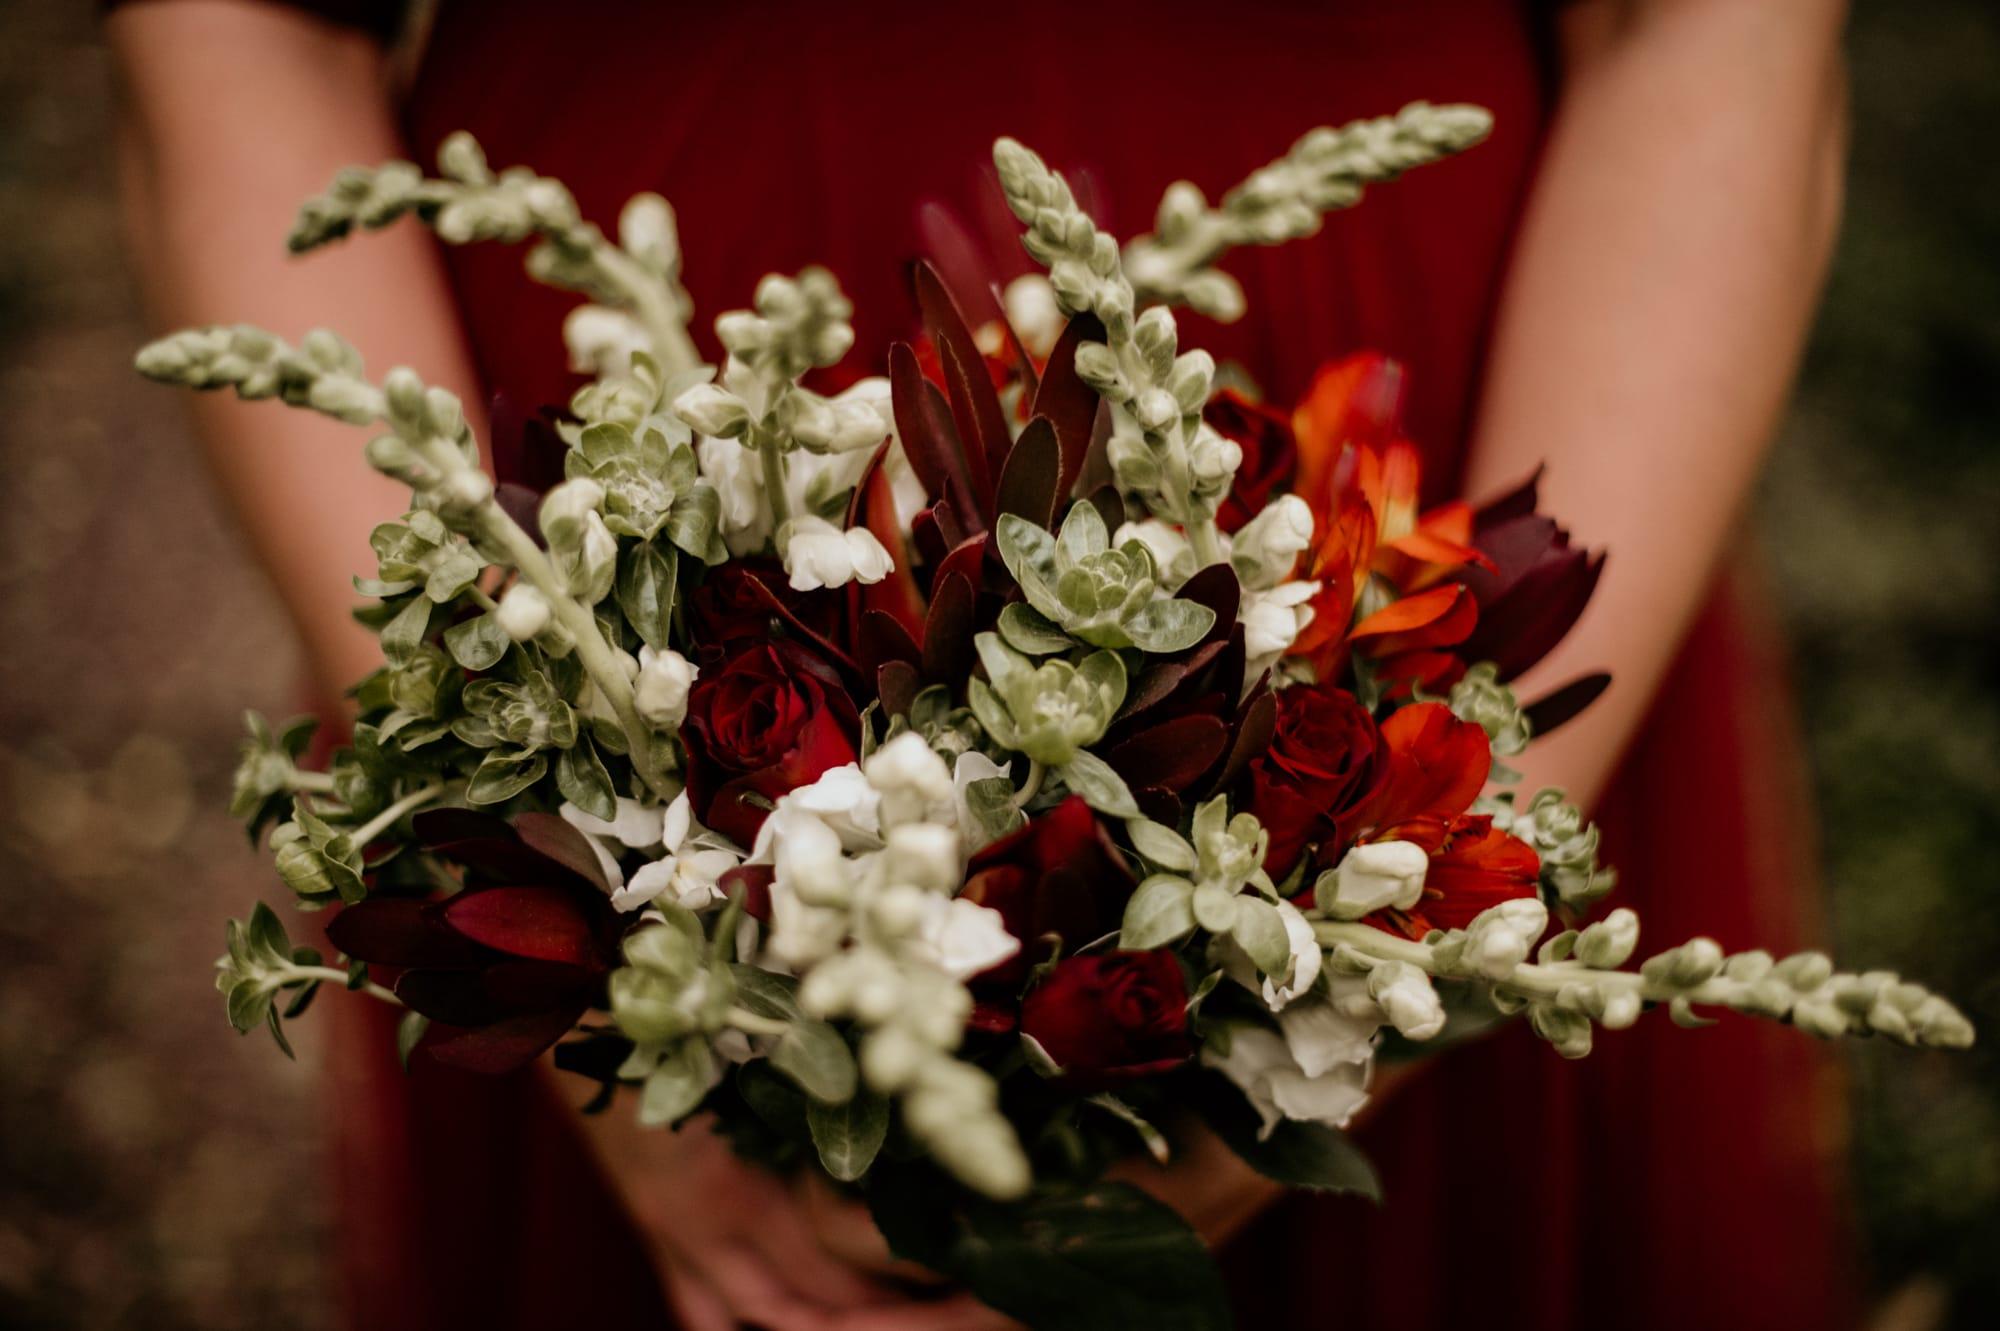 wesley-lanie-george-fernridge-engagement-June-Richards-Photography-Destination-Weddings-Elopements-Garden-Route-34